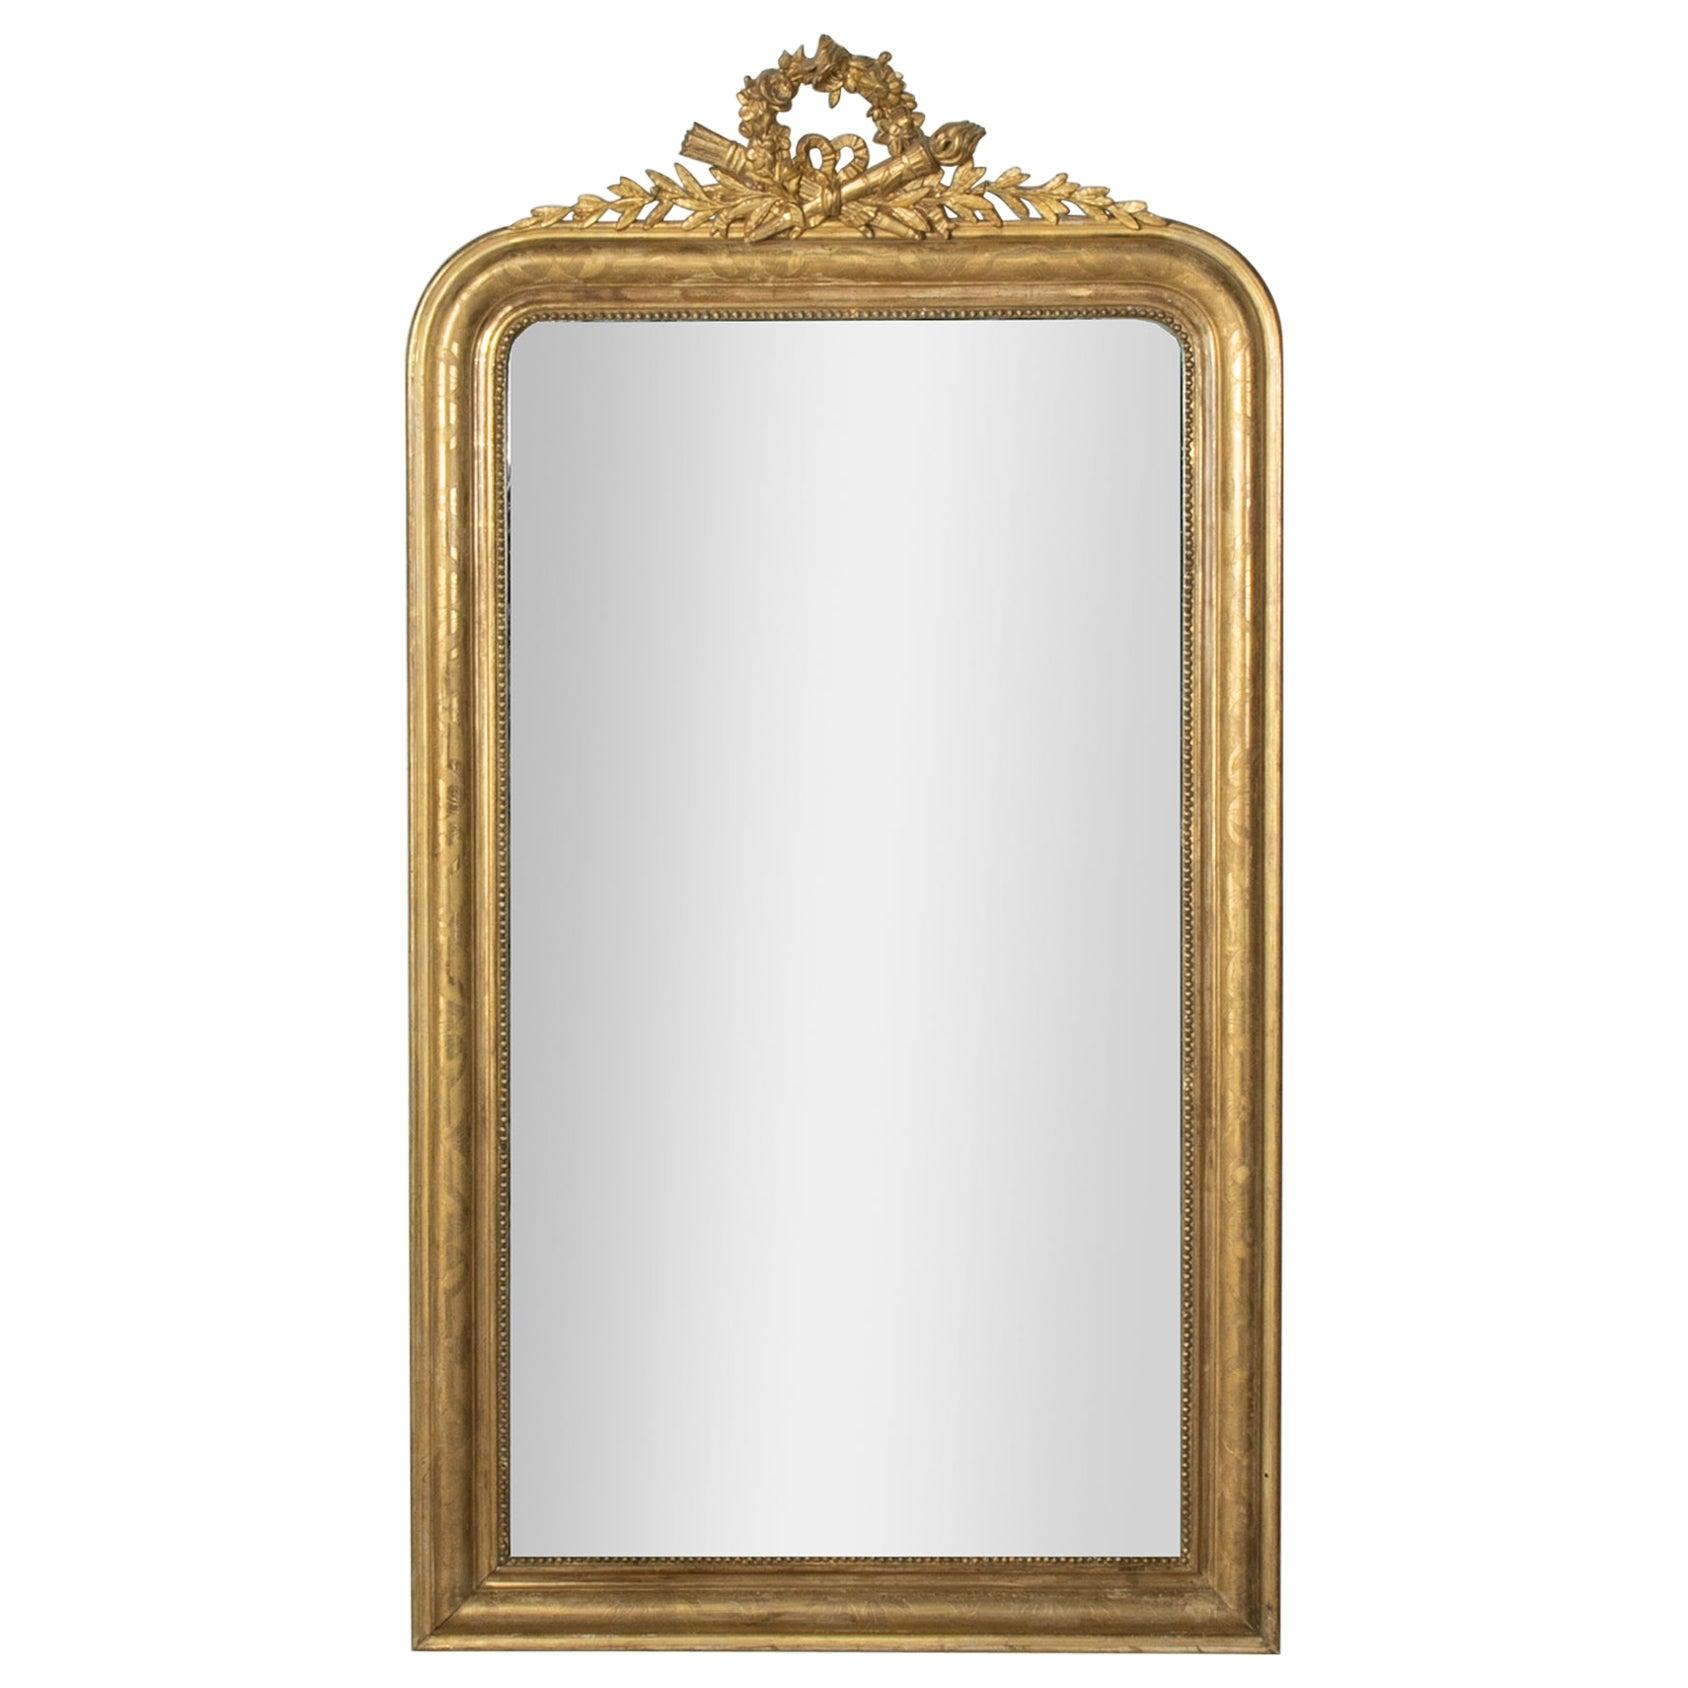 Mid-19th Century French Louis Philippe Style Gilt Wood Mirror, Louis XVI Motif